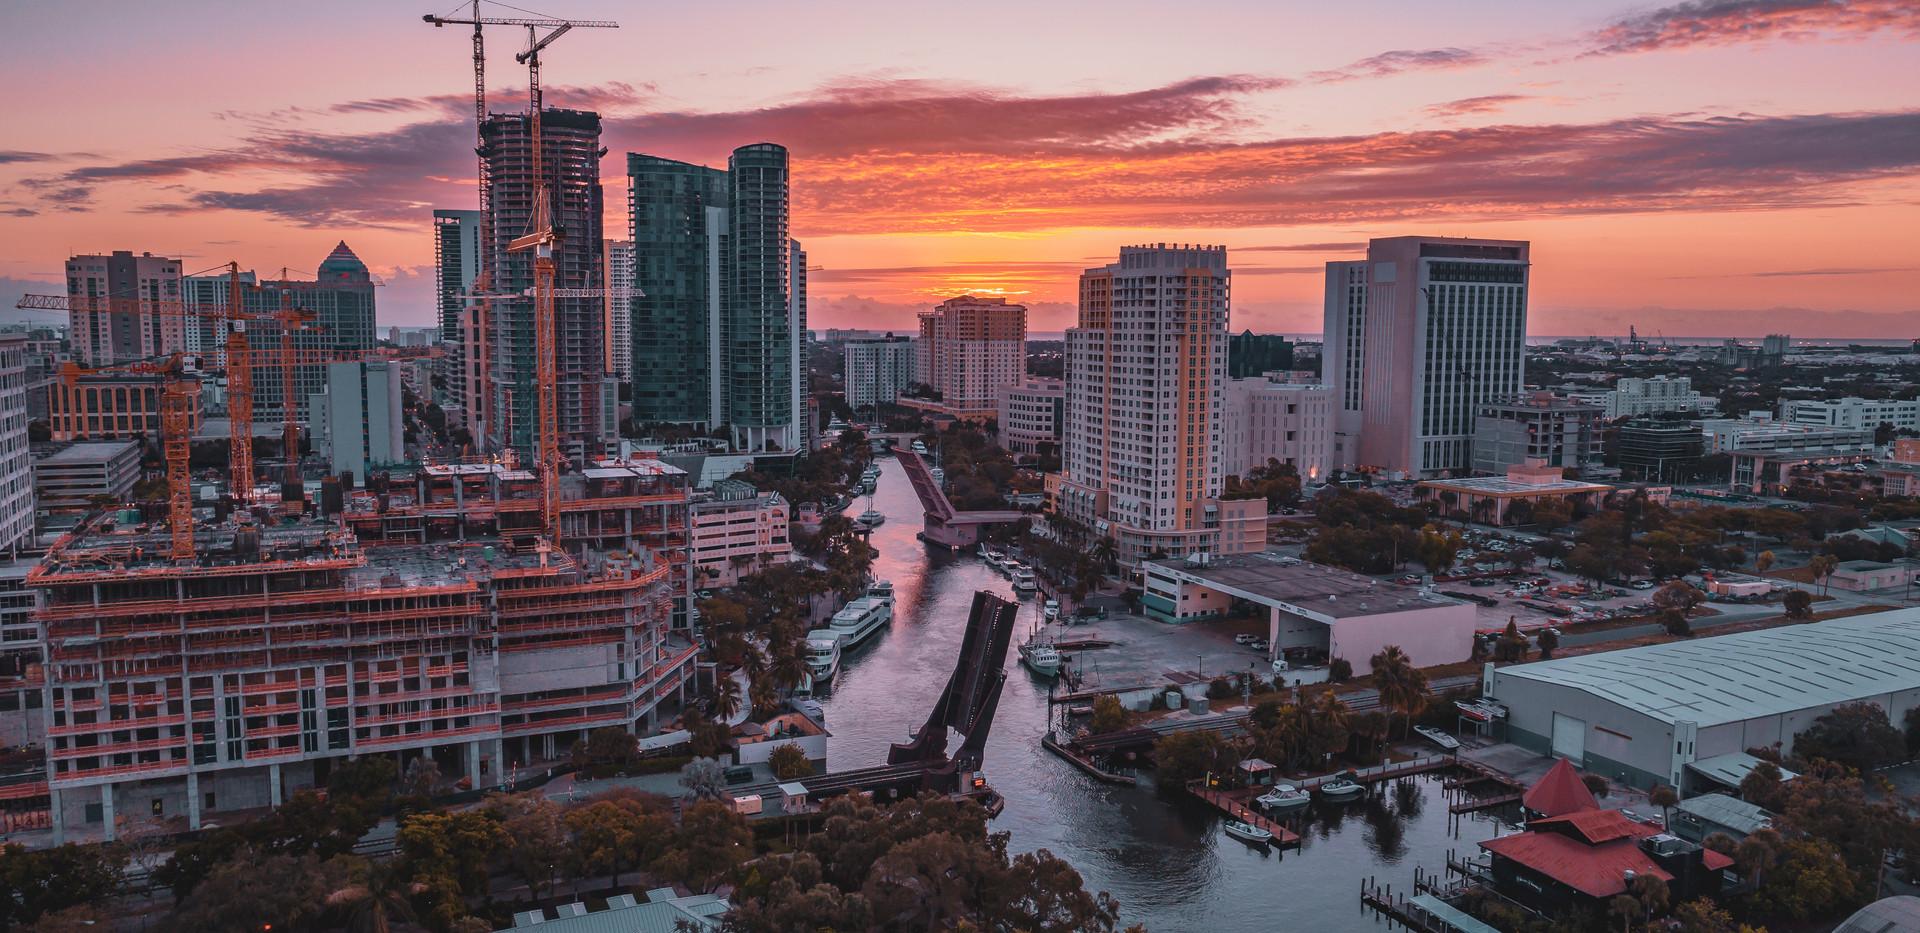 New River at Sunrise